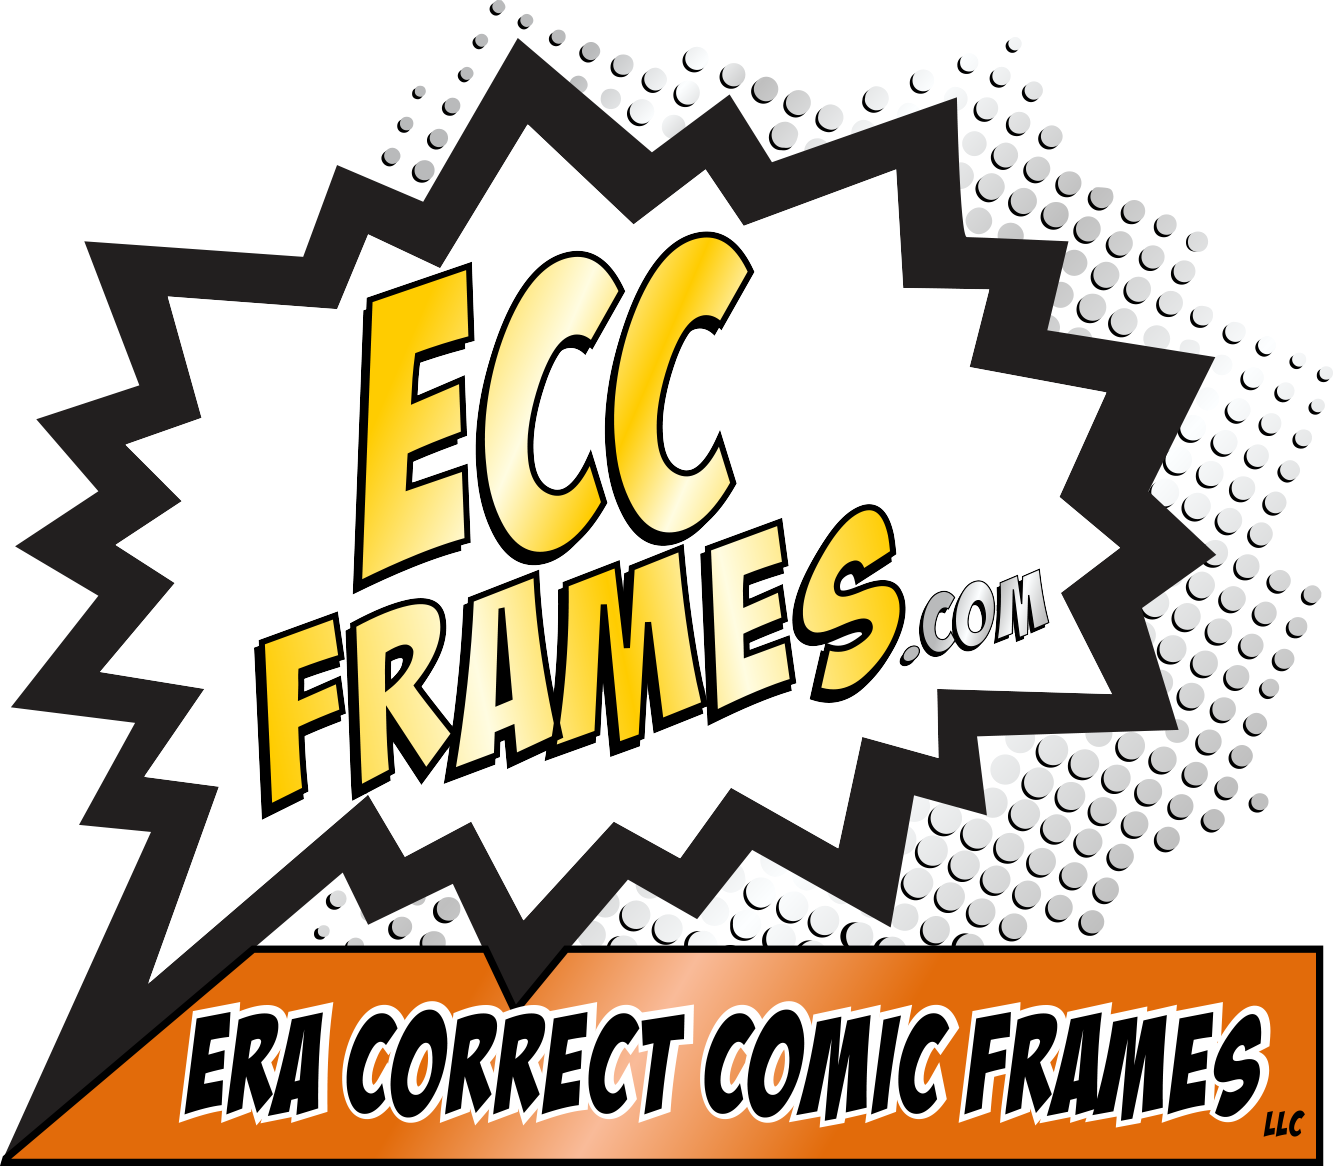 ECC FRAMES